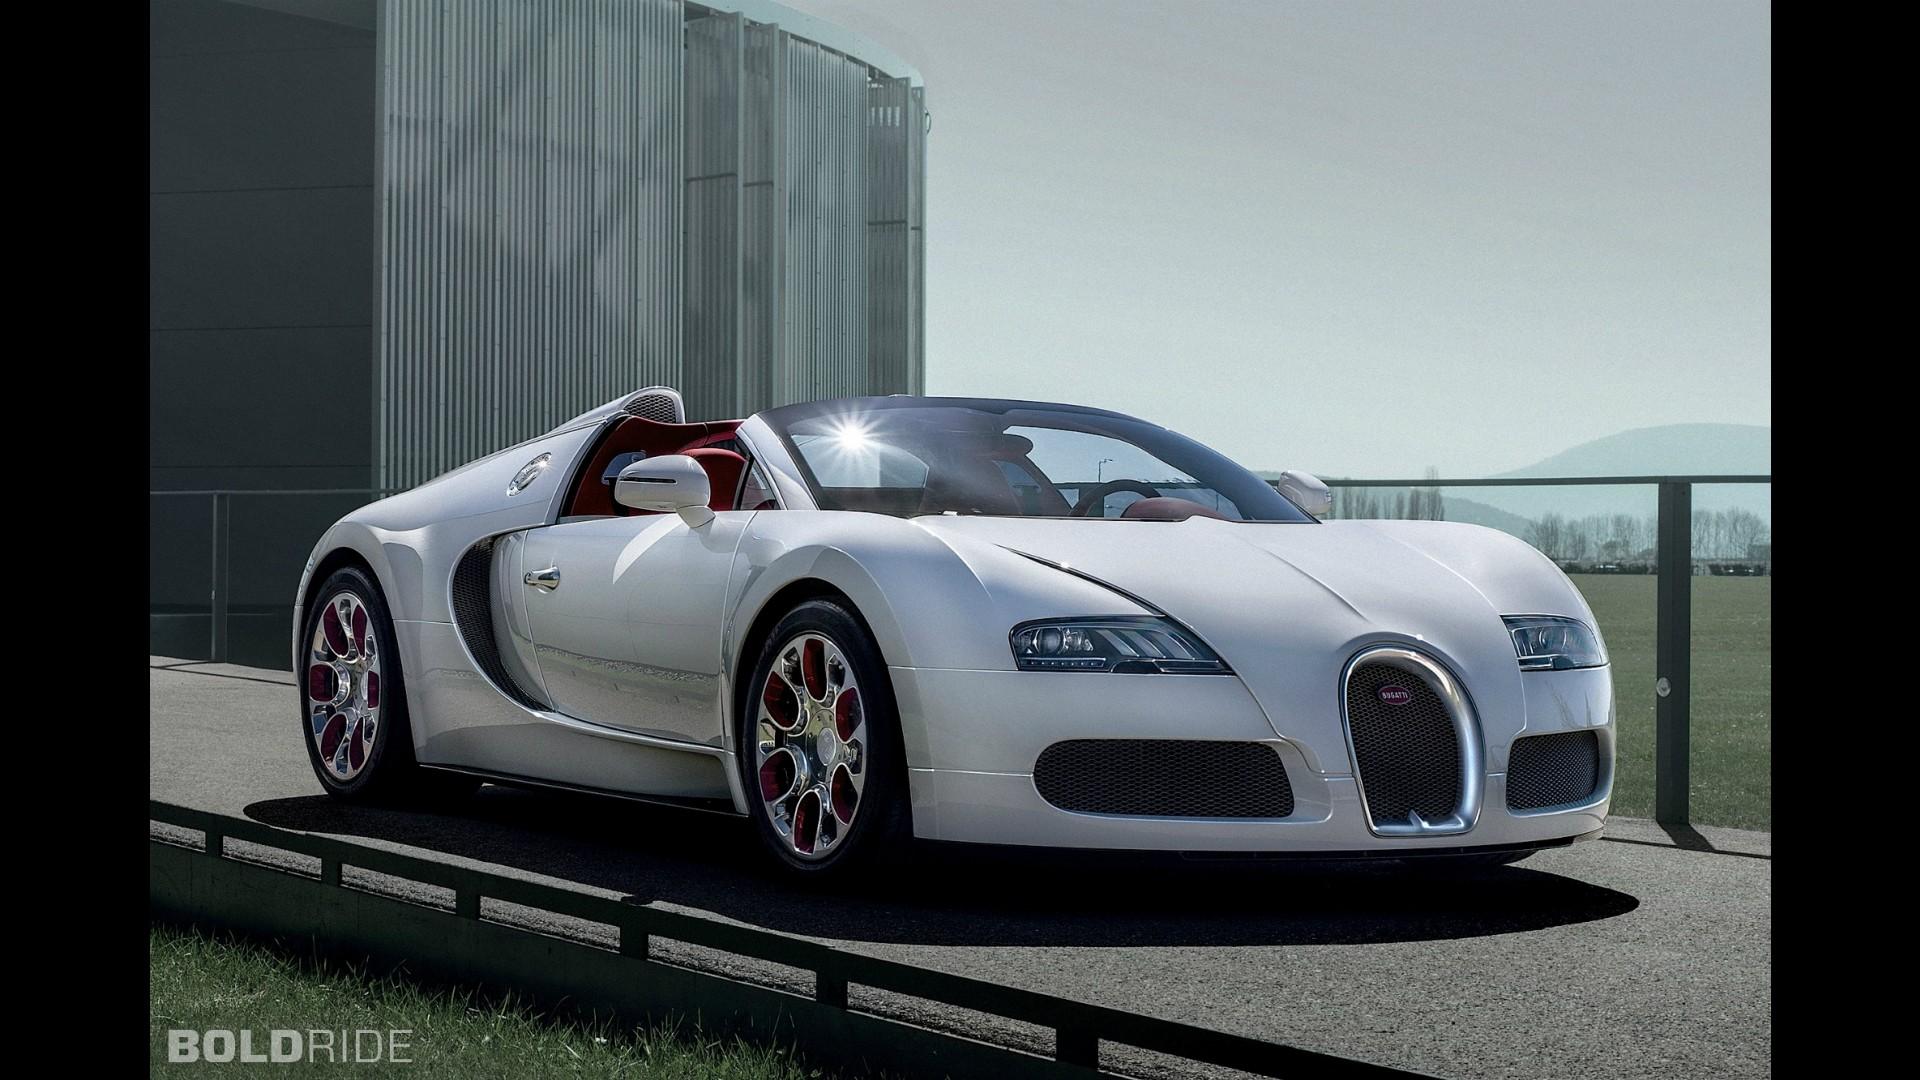 bugatti-veyron-grand-sport-wei-long Wonderful Bugatti Veyron On Road Price Cars Trend